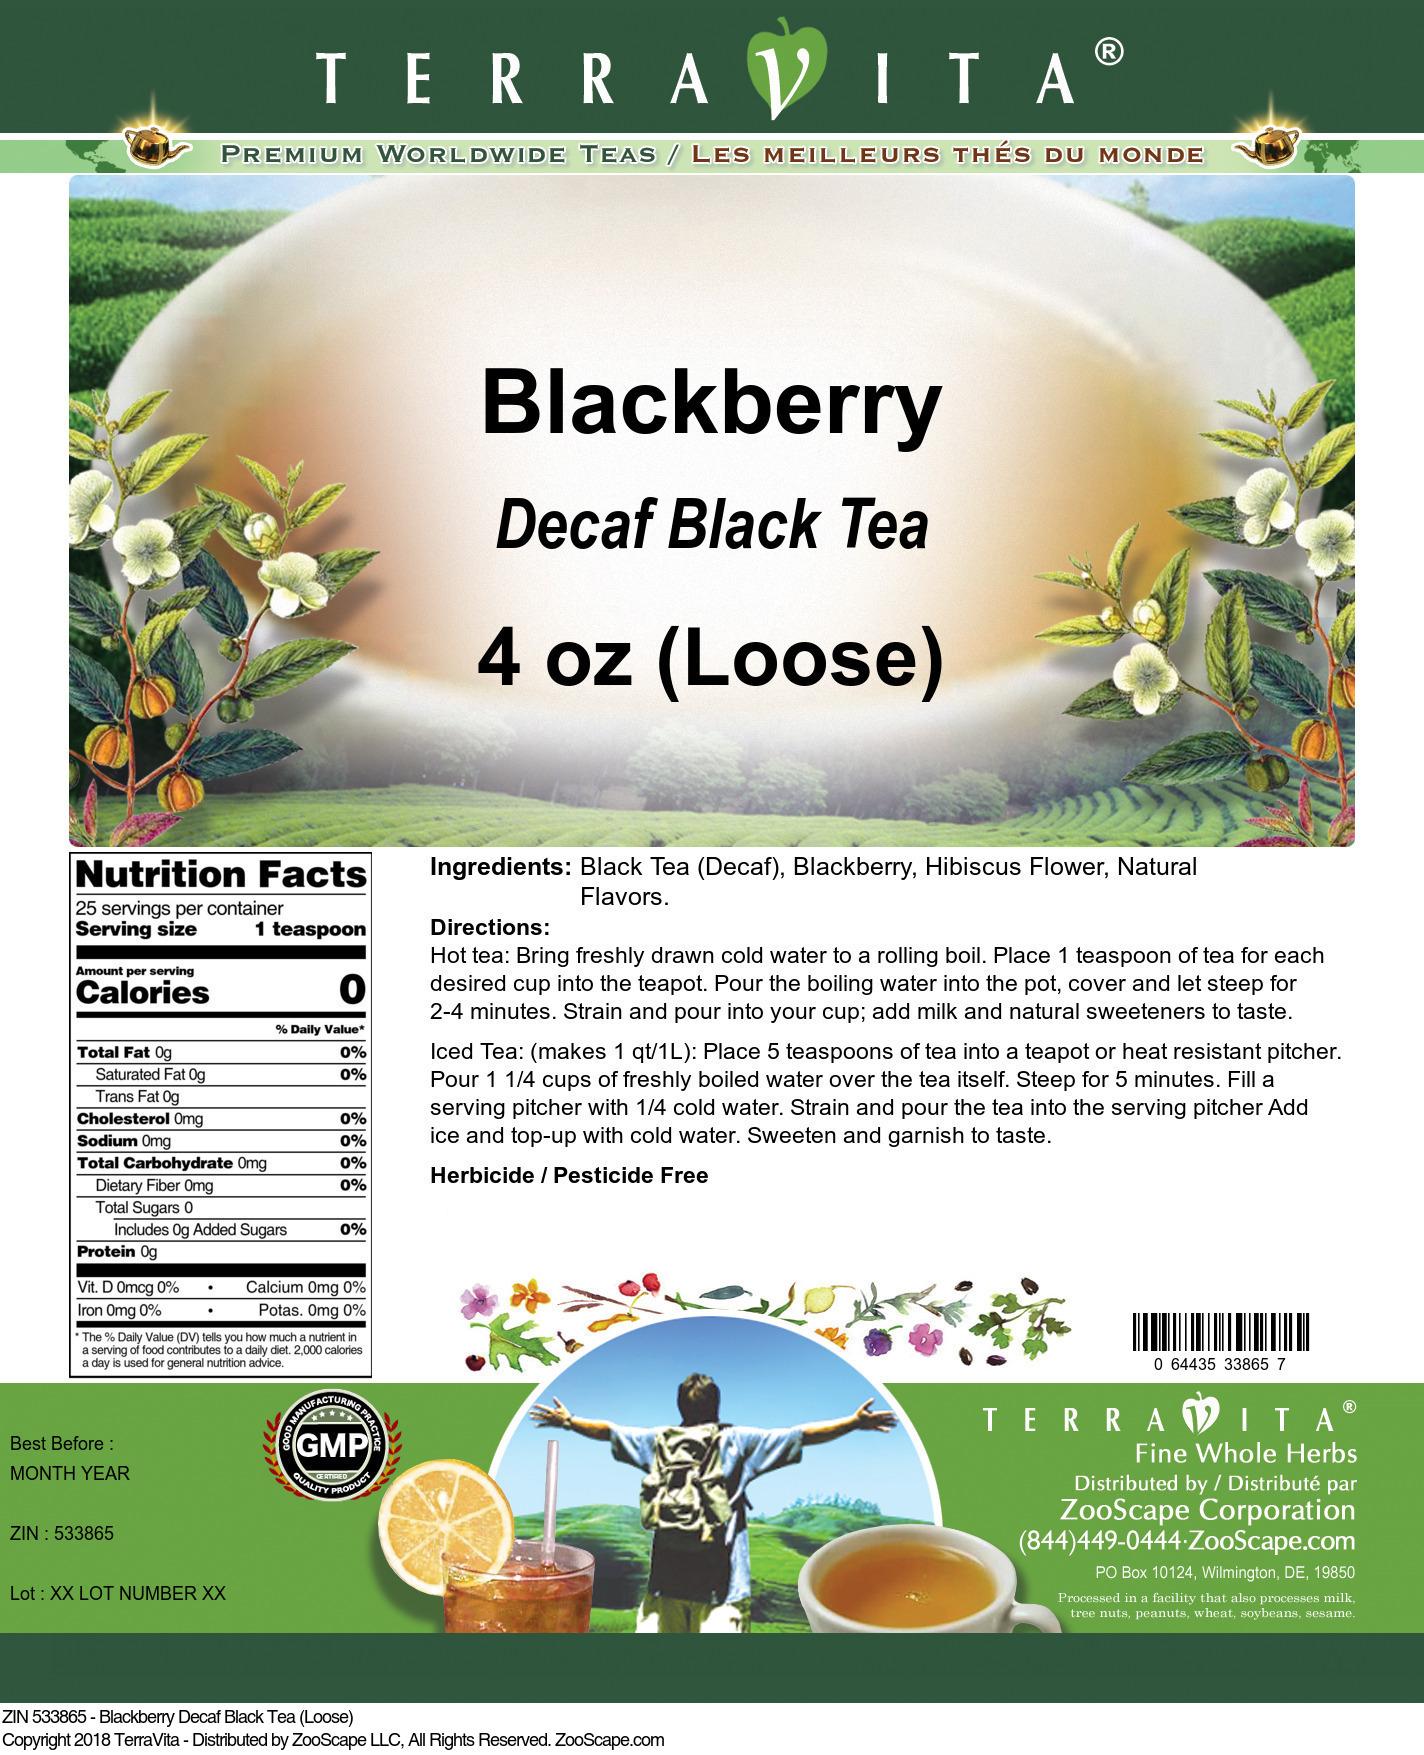 Blackberry Decaf Black Tea (Loose)